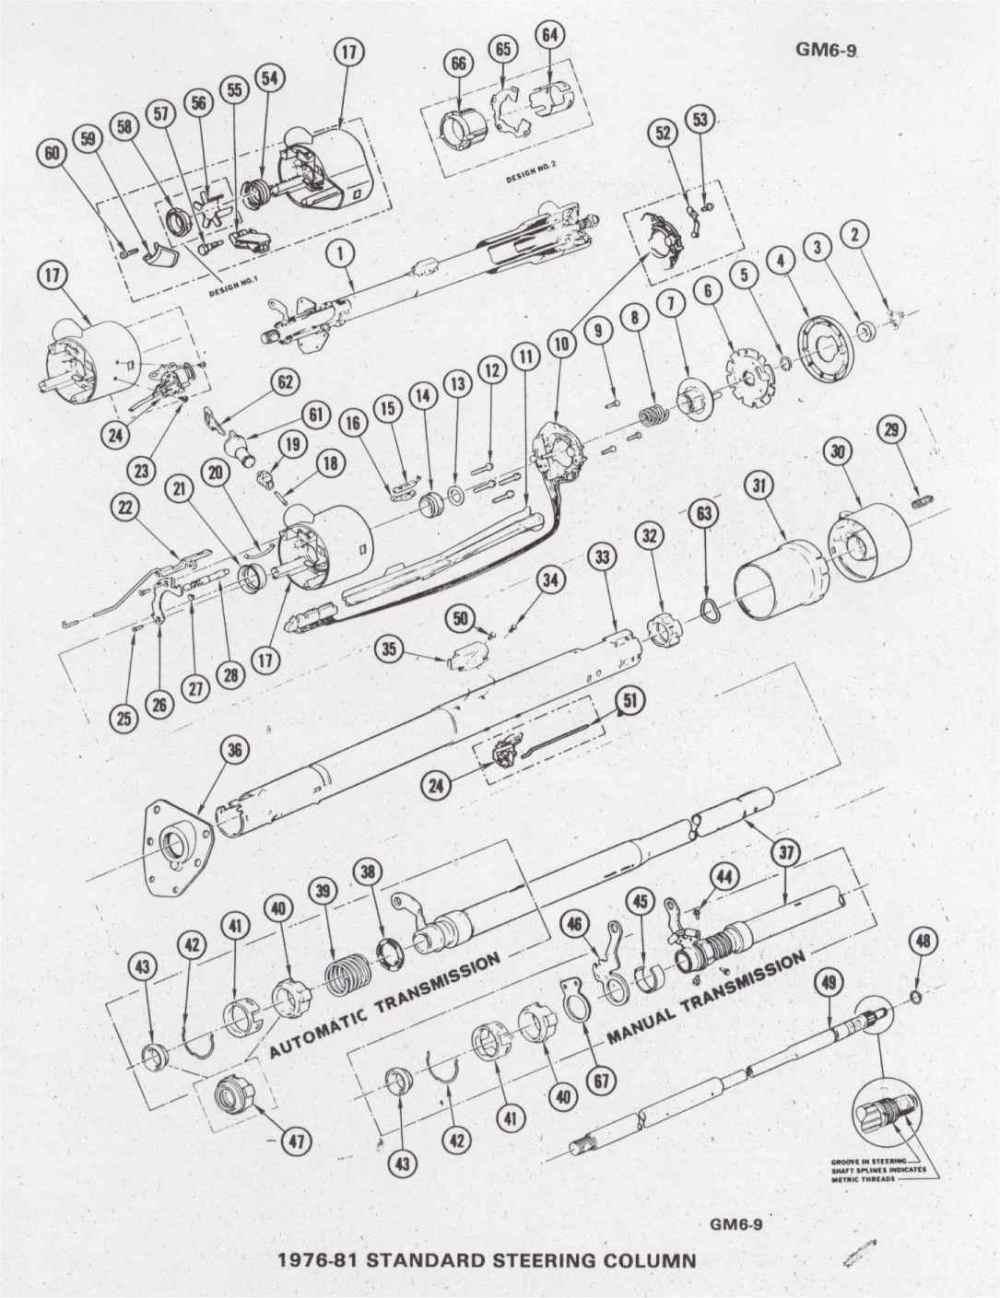 medium resolution of 1972 chevy steering column parts diagram house wiring diagram 1985 corvette steering column diagram c4 corvette